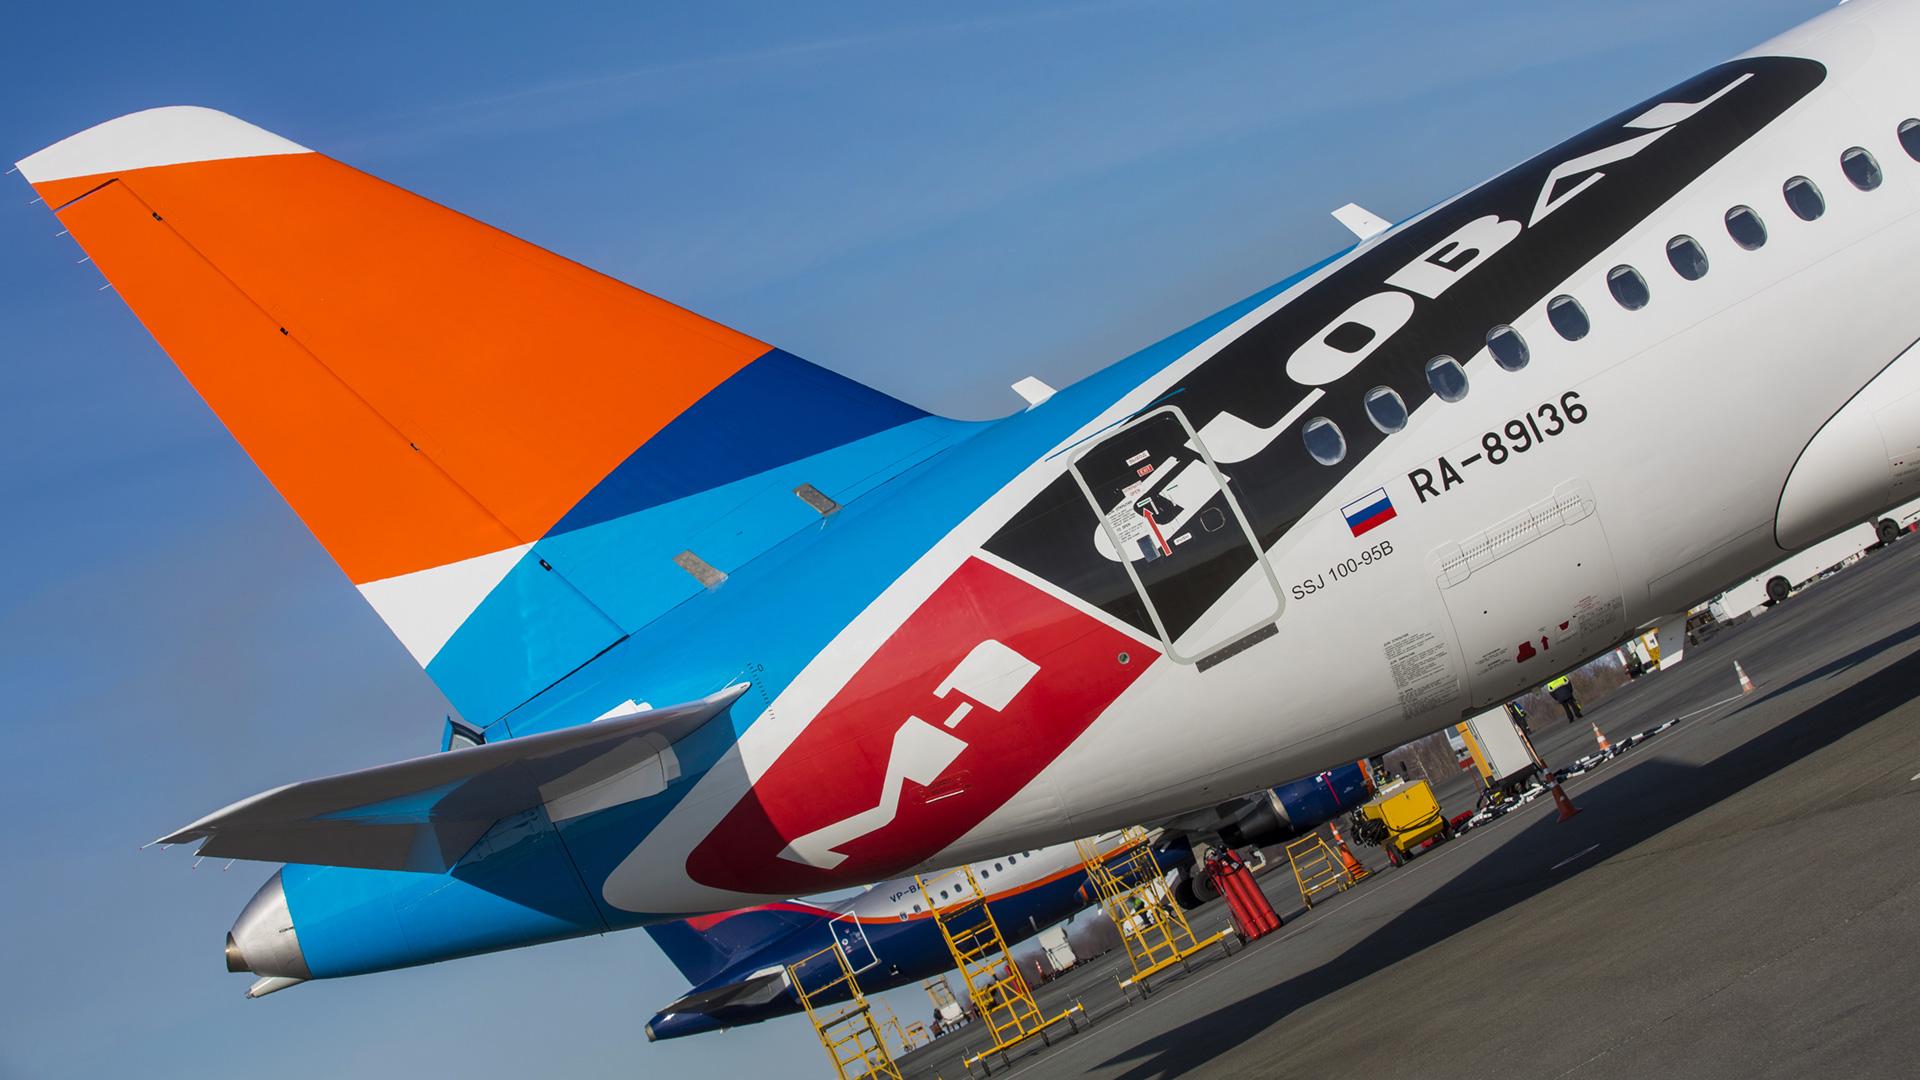 Кобрендинг авиакомпании Азимут и промоутерской компании M-1 Global